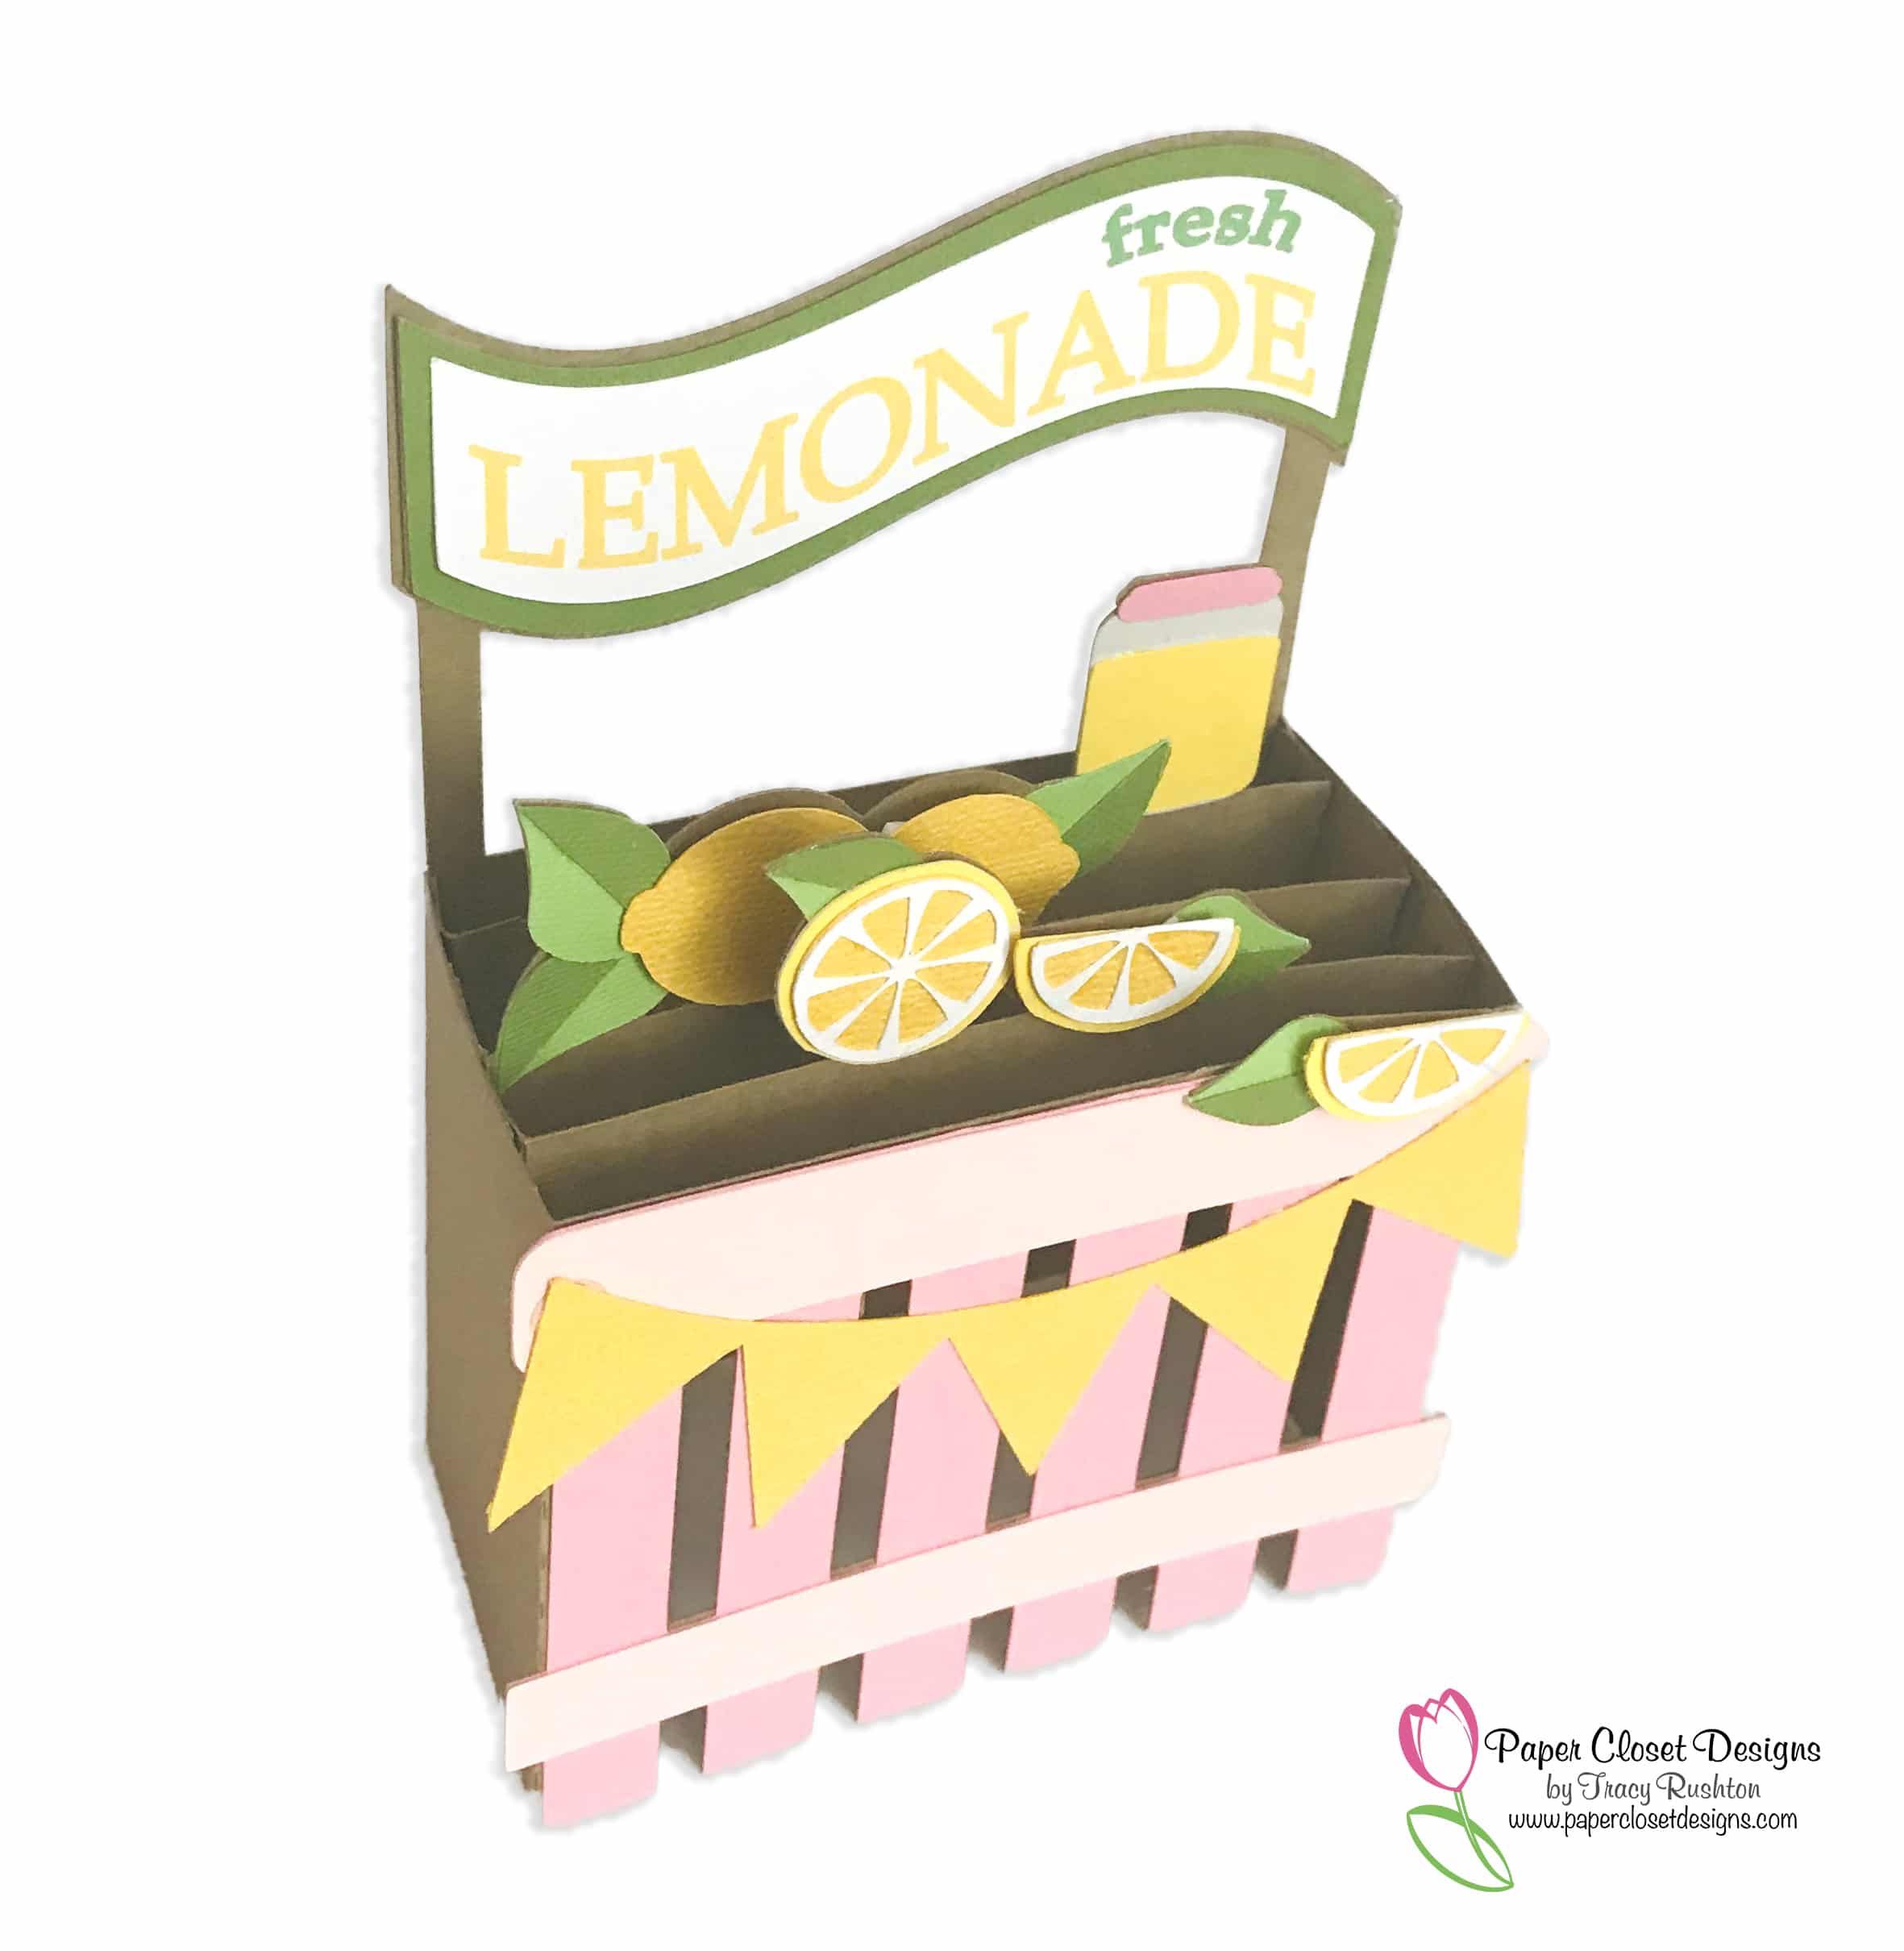 Lemonade Stand Card